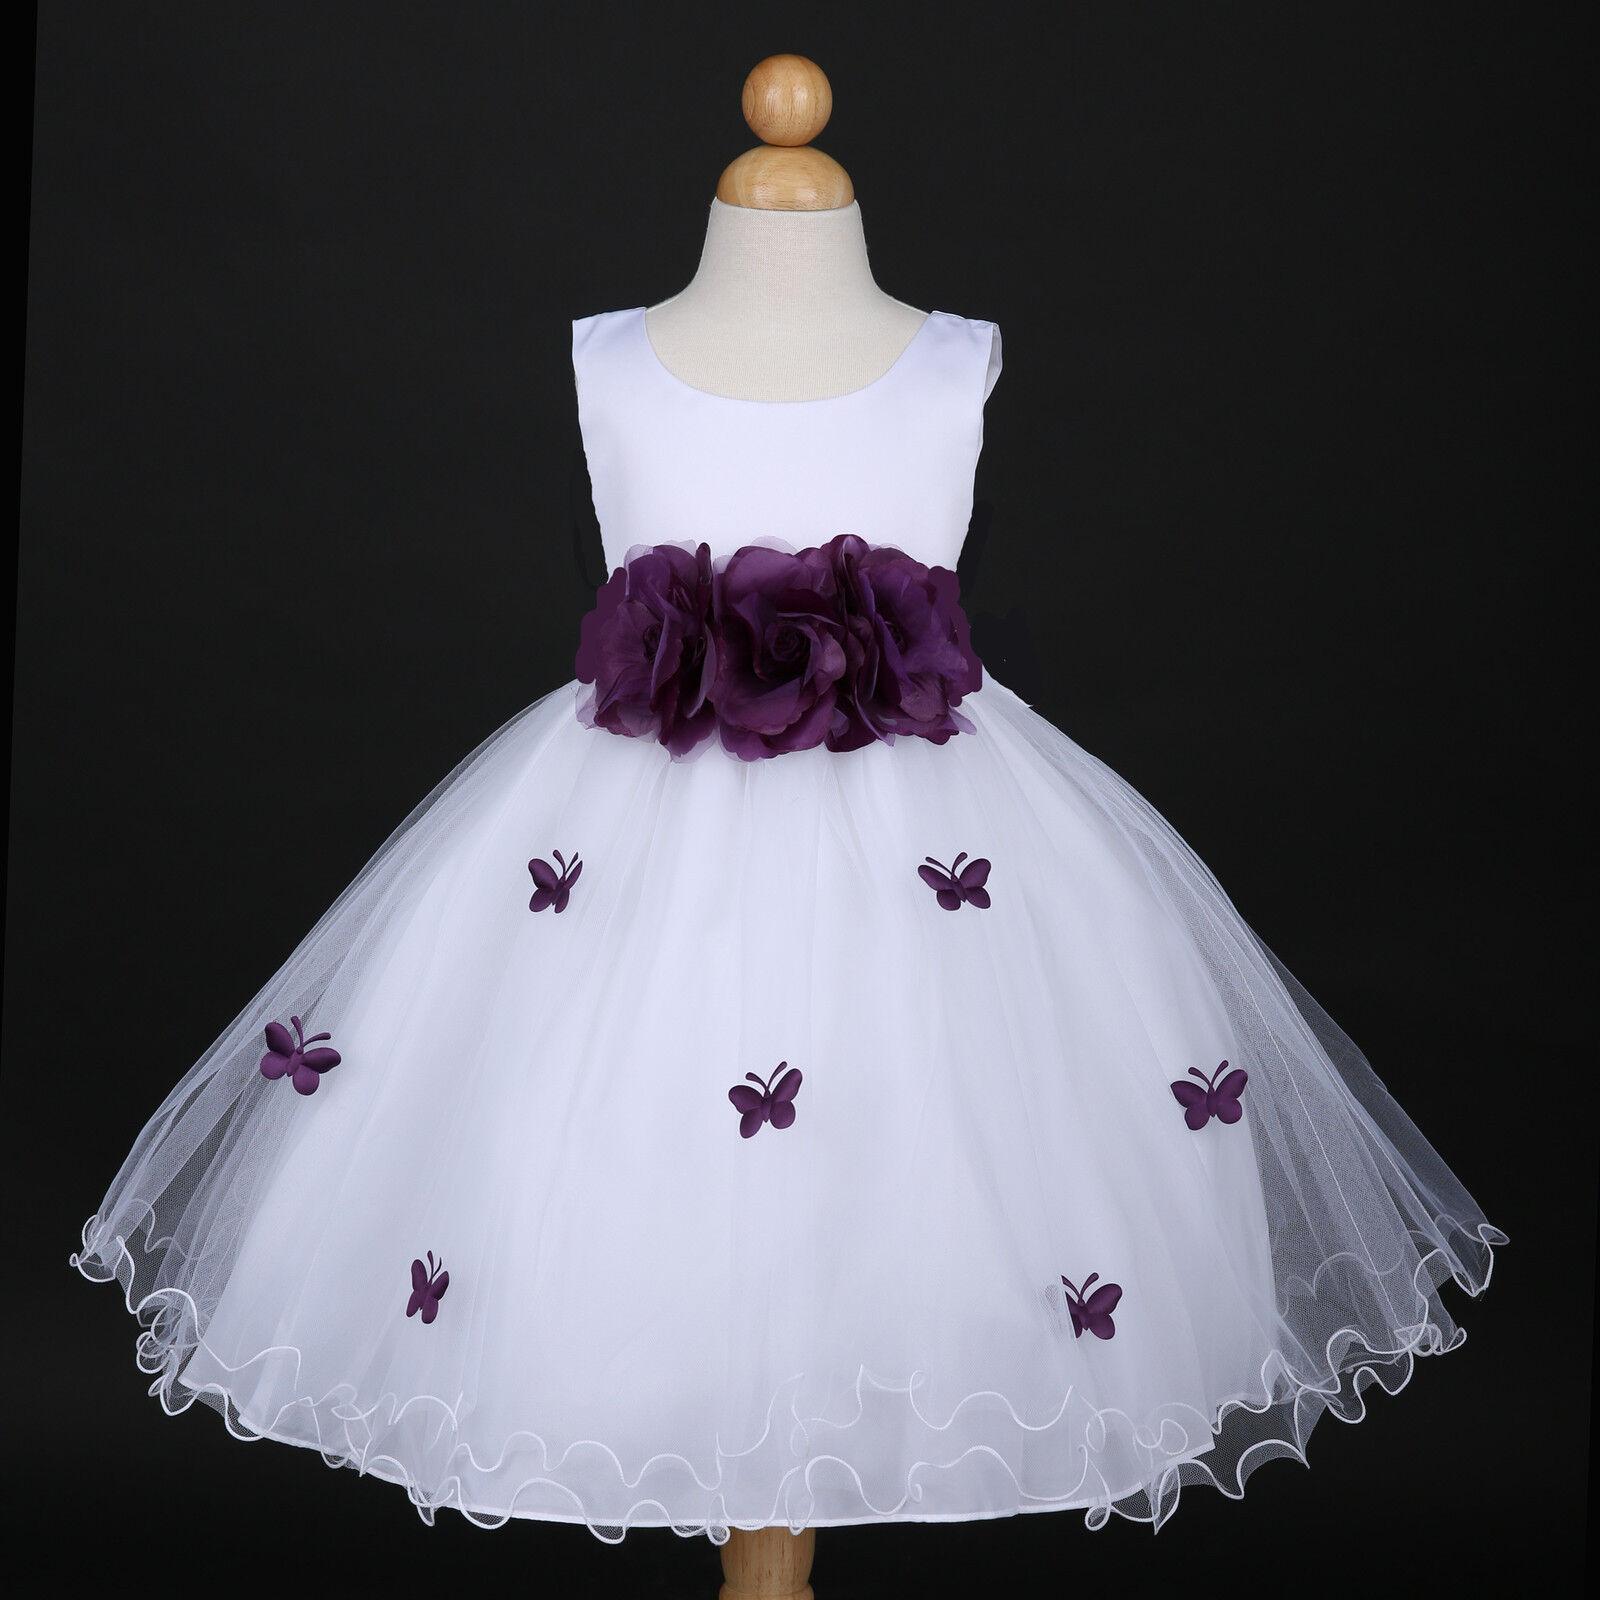 White/Plum Purple Wedding Flower Girl Dress Pageant Gown 6M 12M 18M 2 4 6 8 10